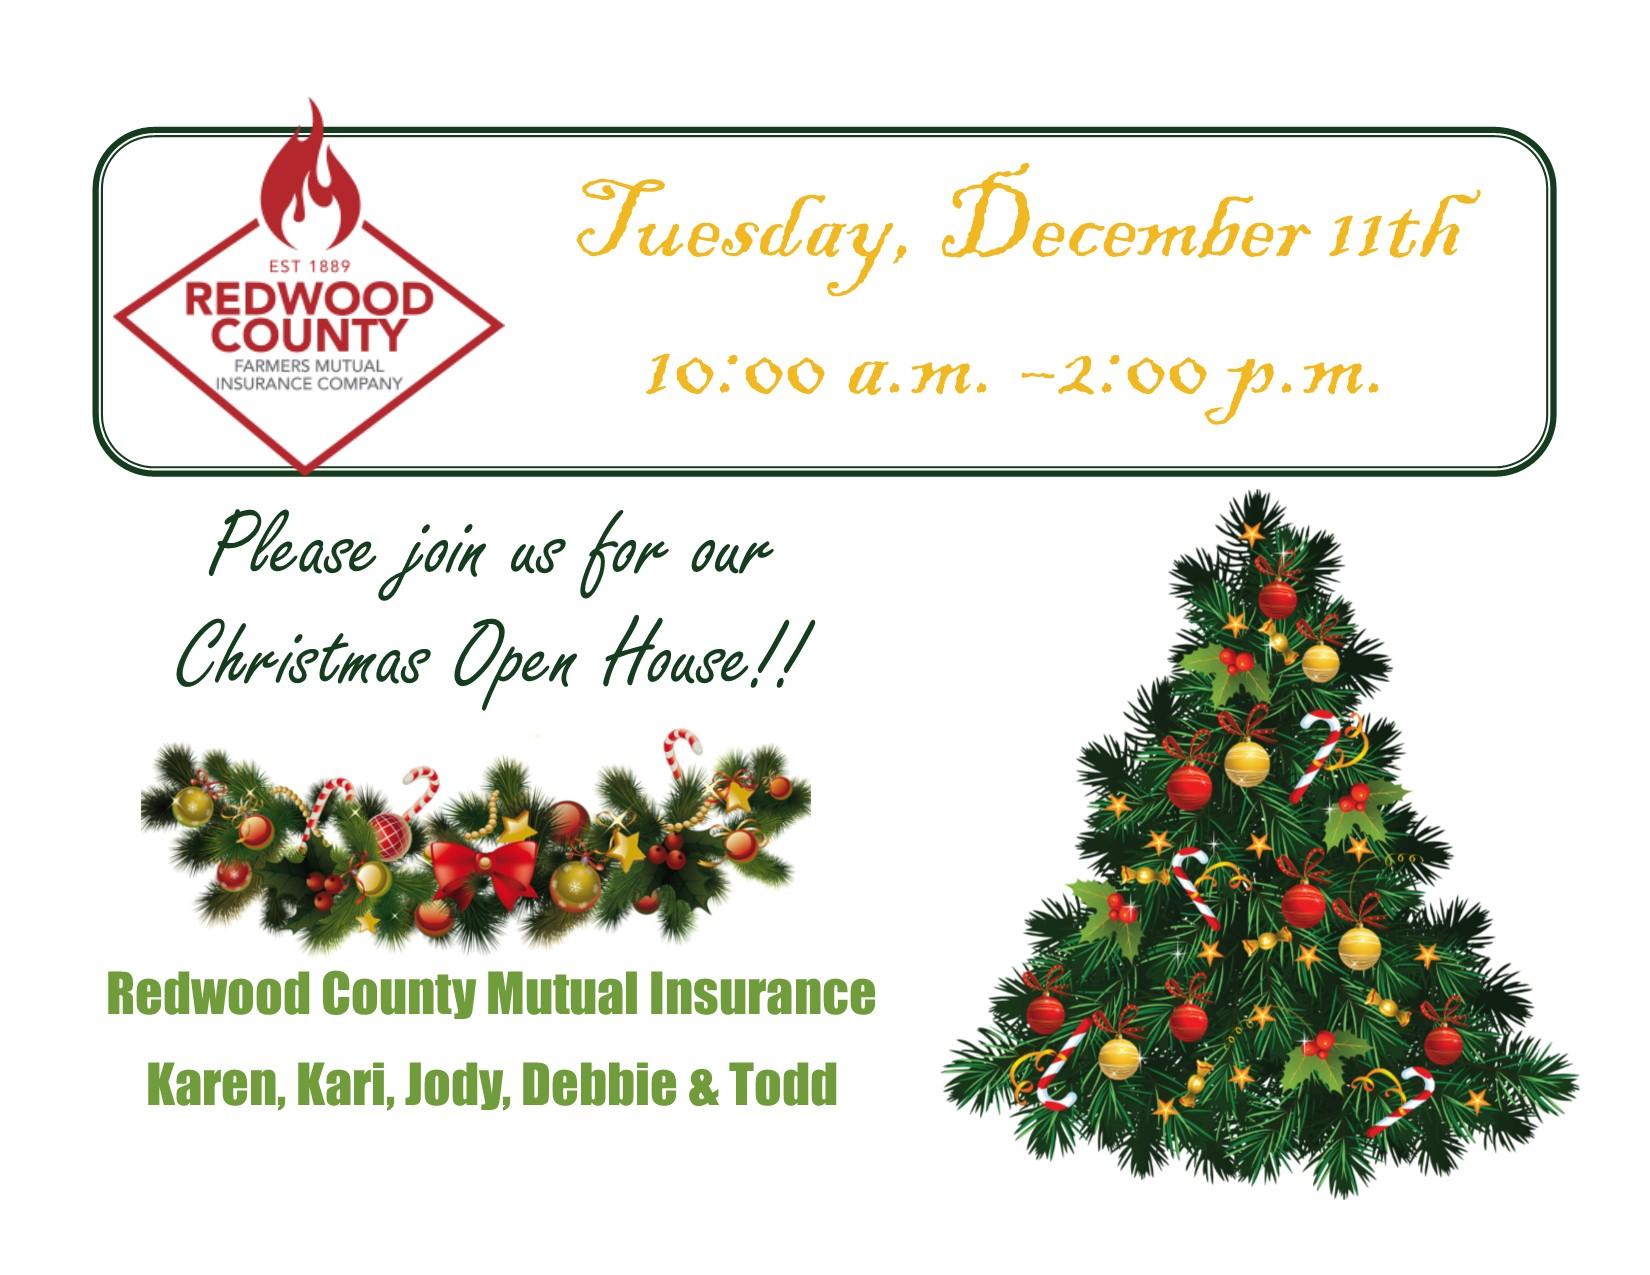 Christmas Open House.Christmas Open House Redwood County Farmers Mutual